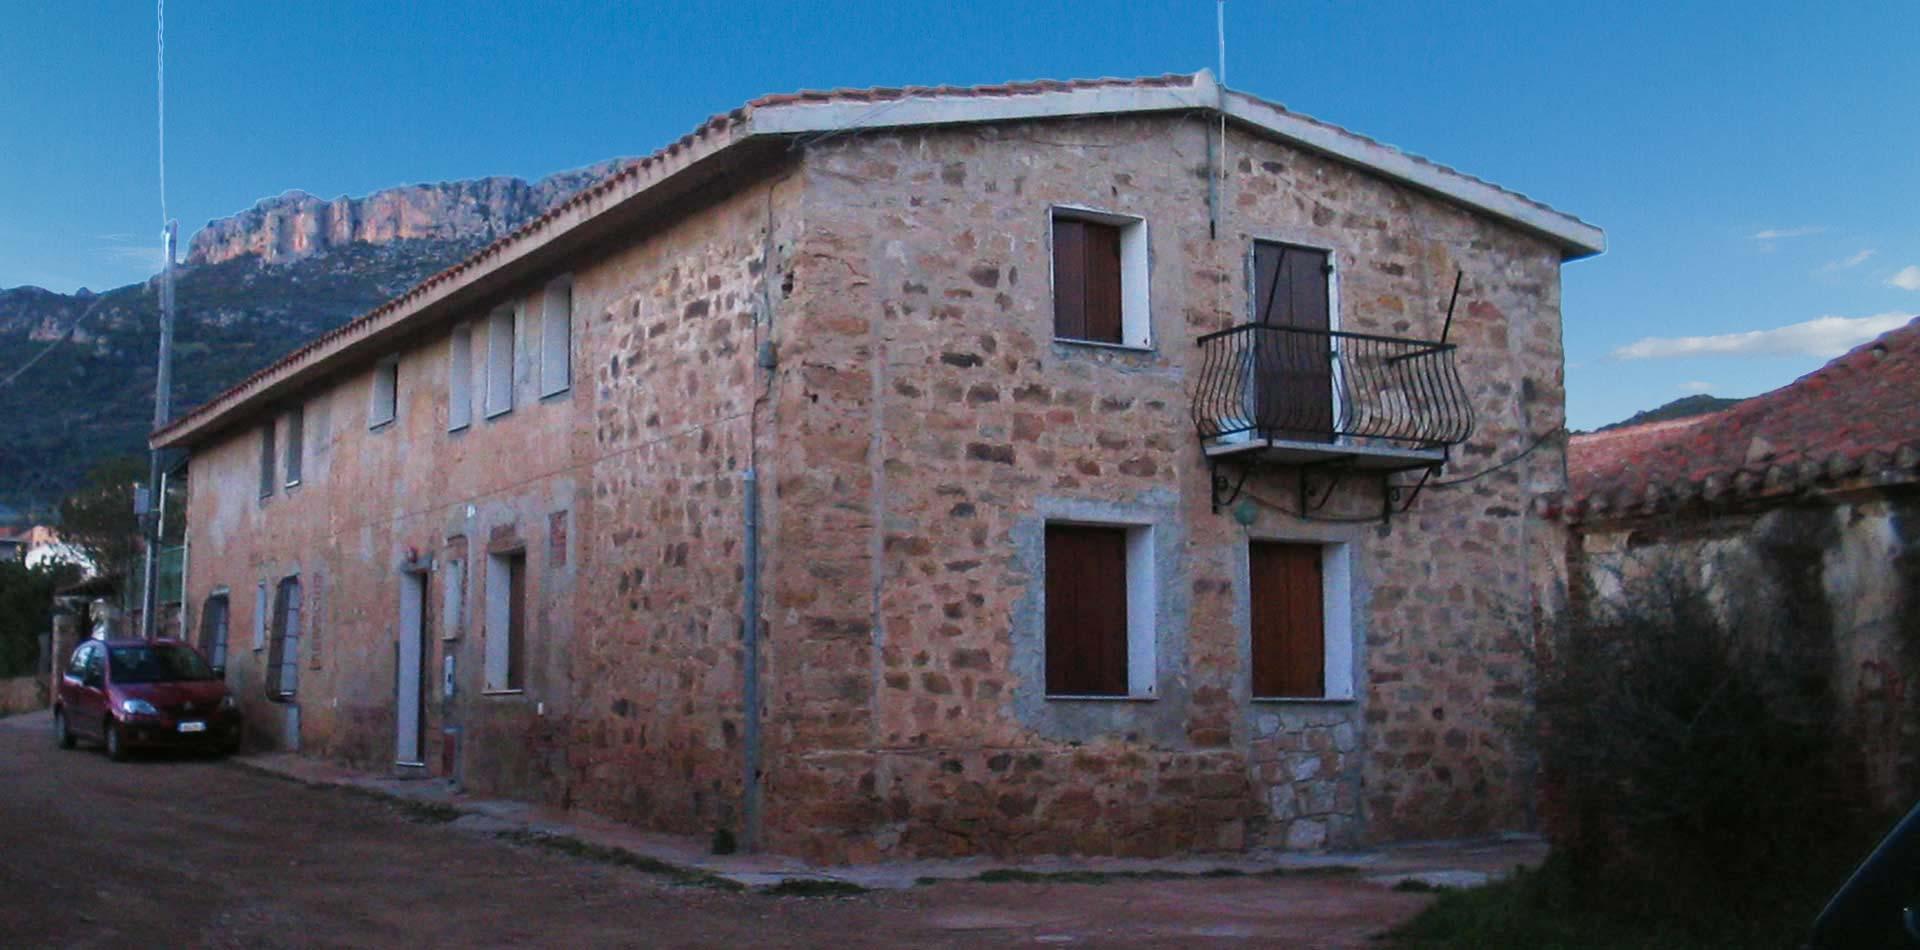 Appartamenti Pedras - Hotel a santa maria navarrese